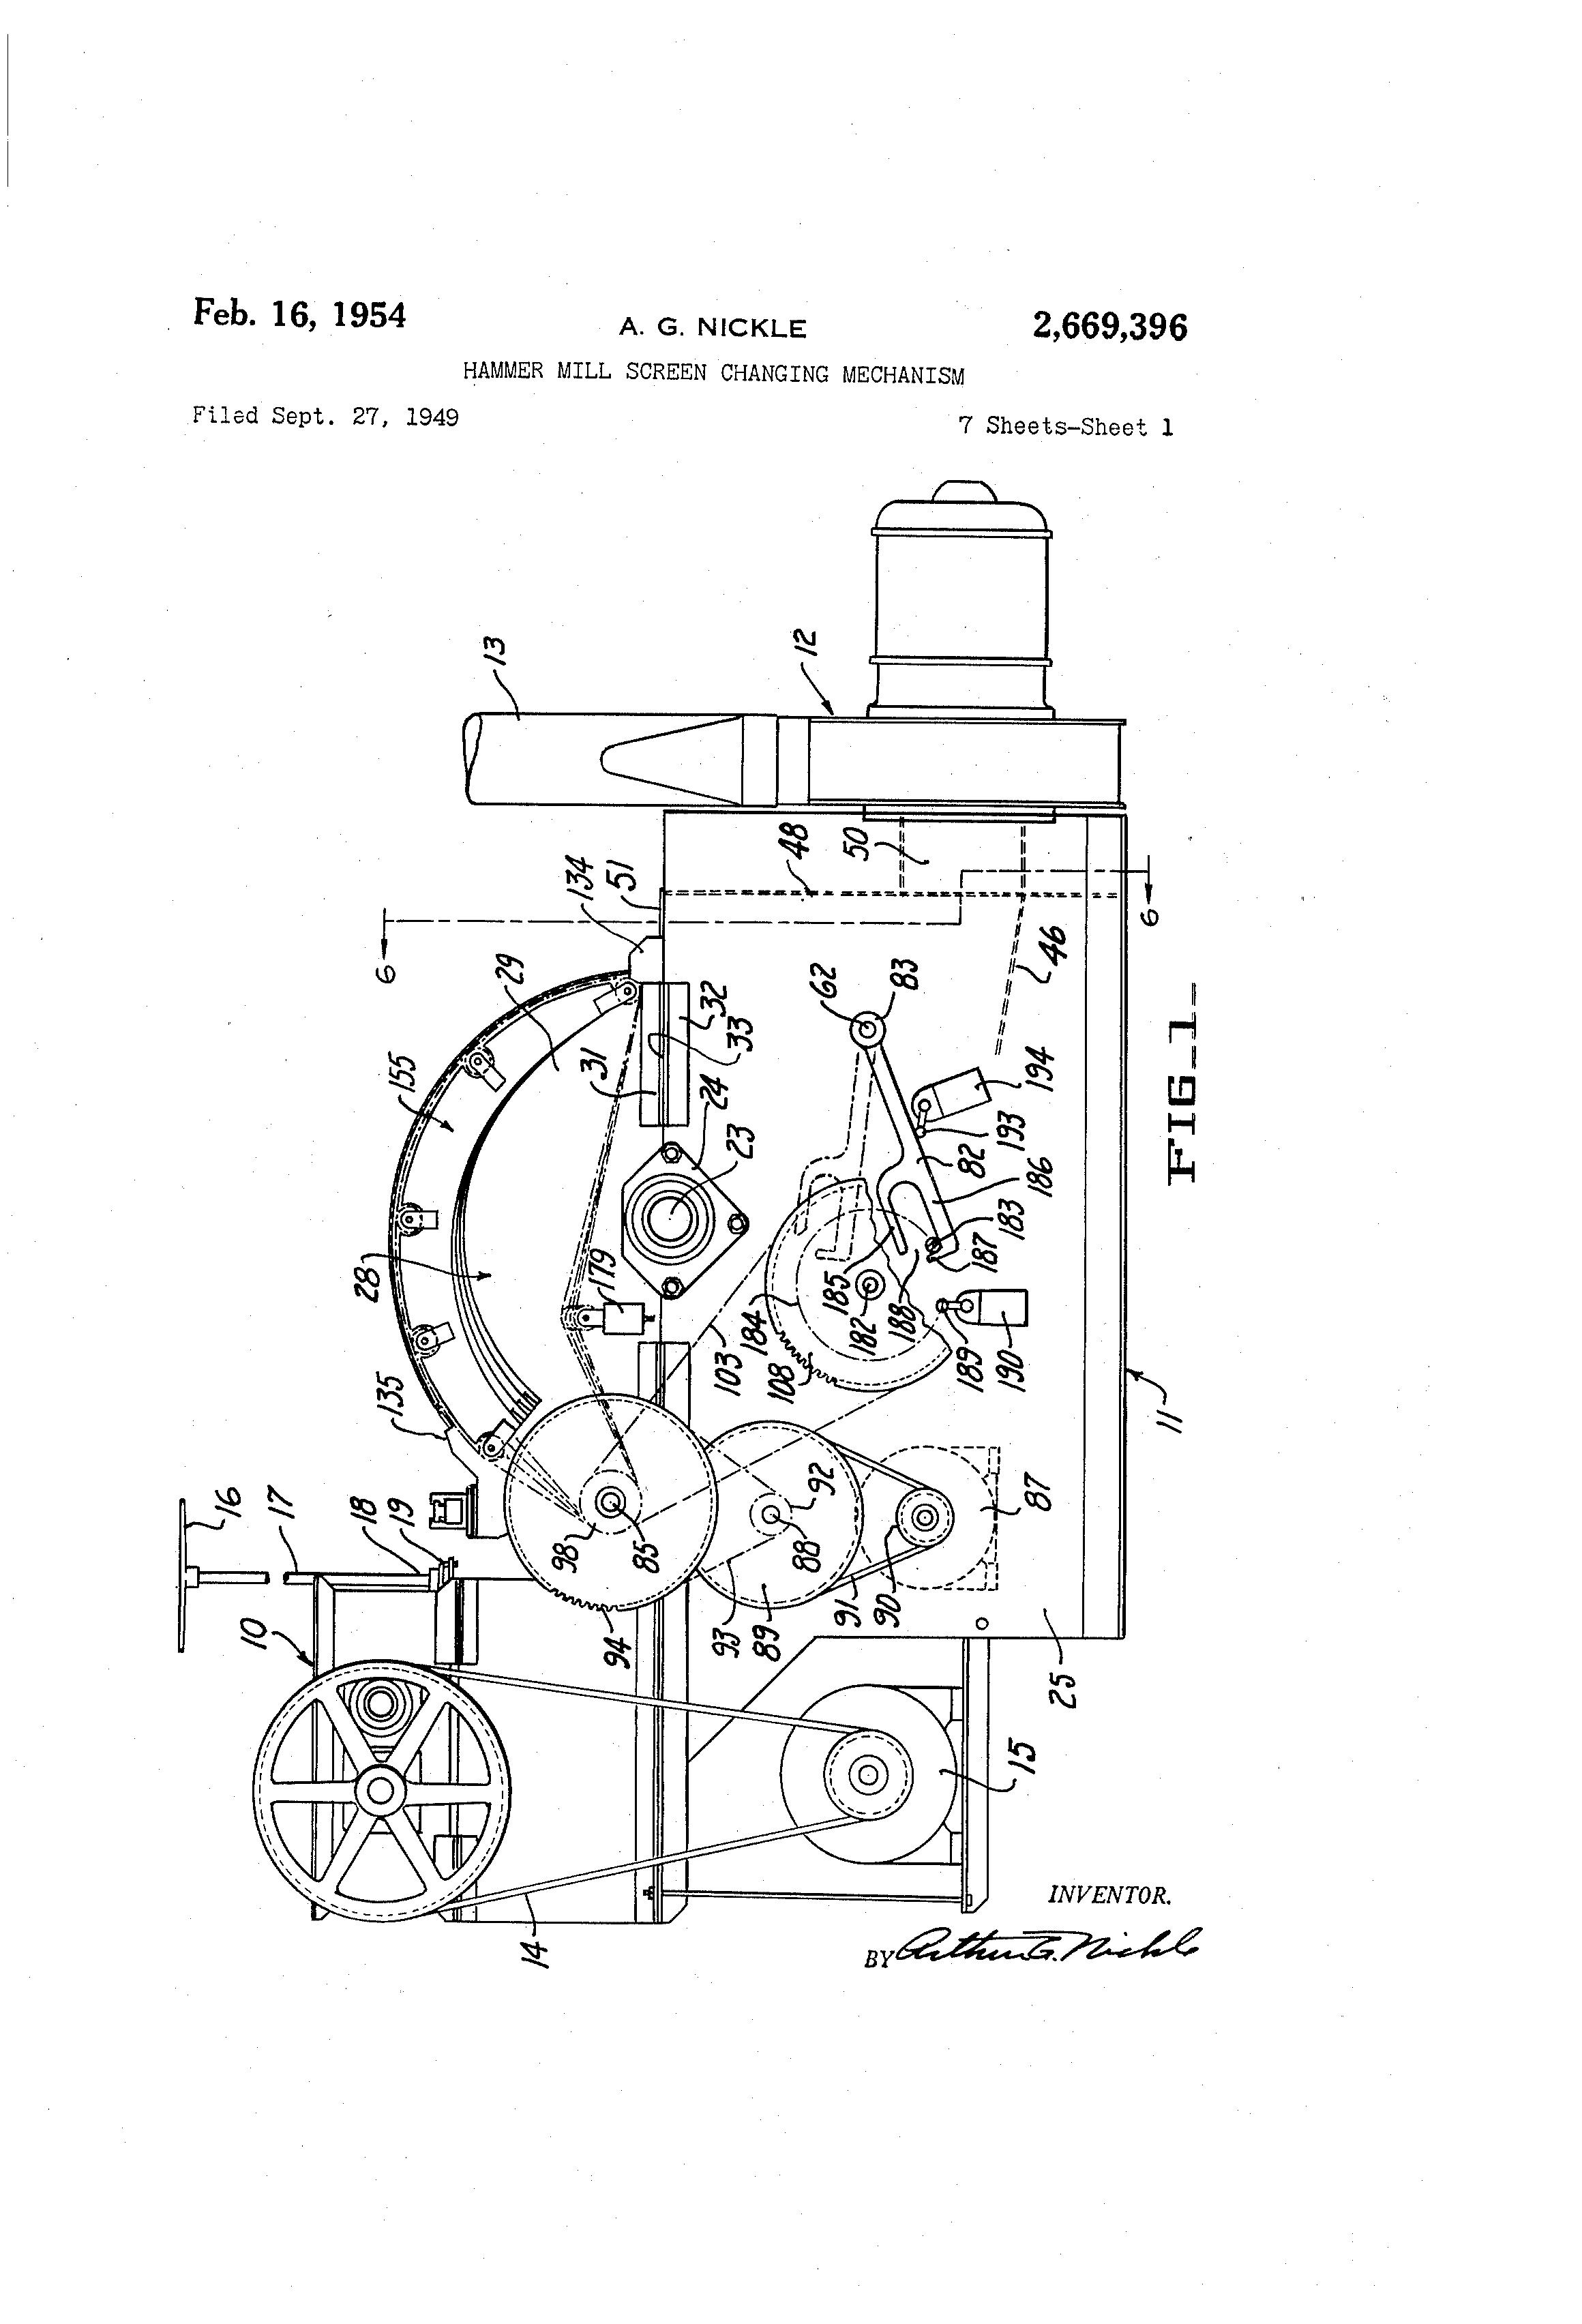 Malt Mill Motor Wiring Diagram | Wiring Liry Malt Mill Motor Wiring Diagram on